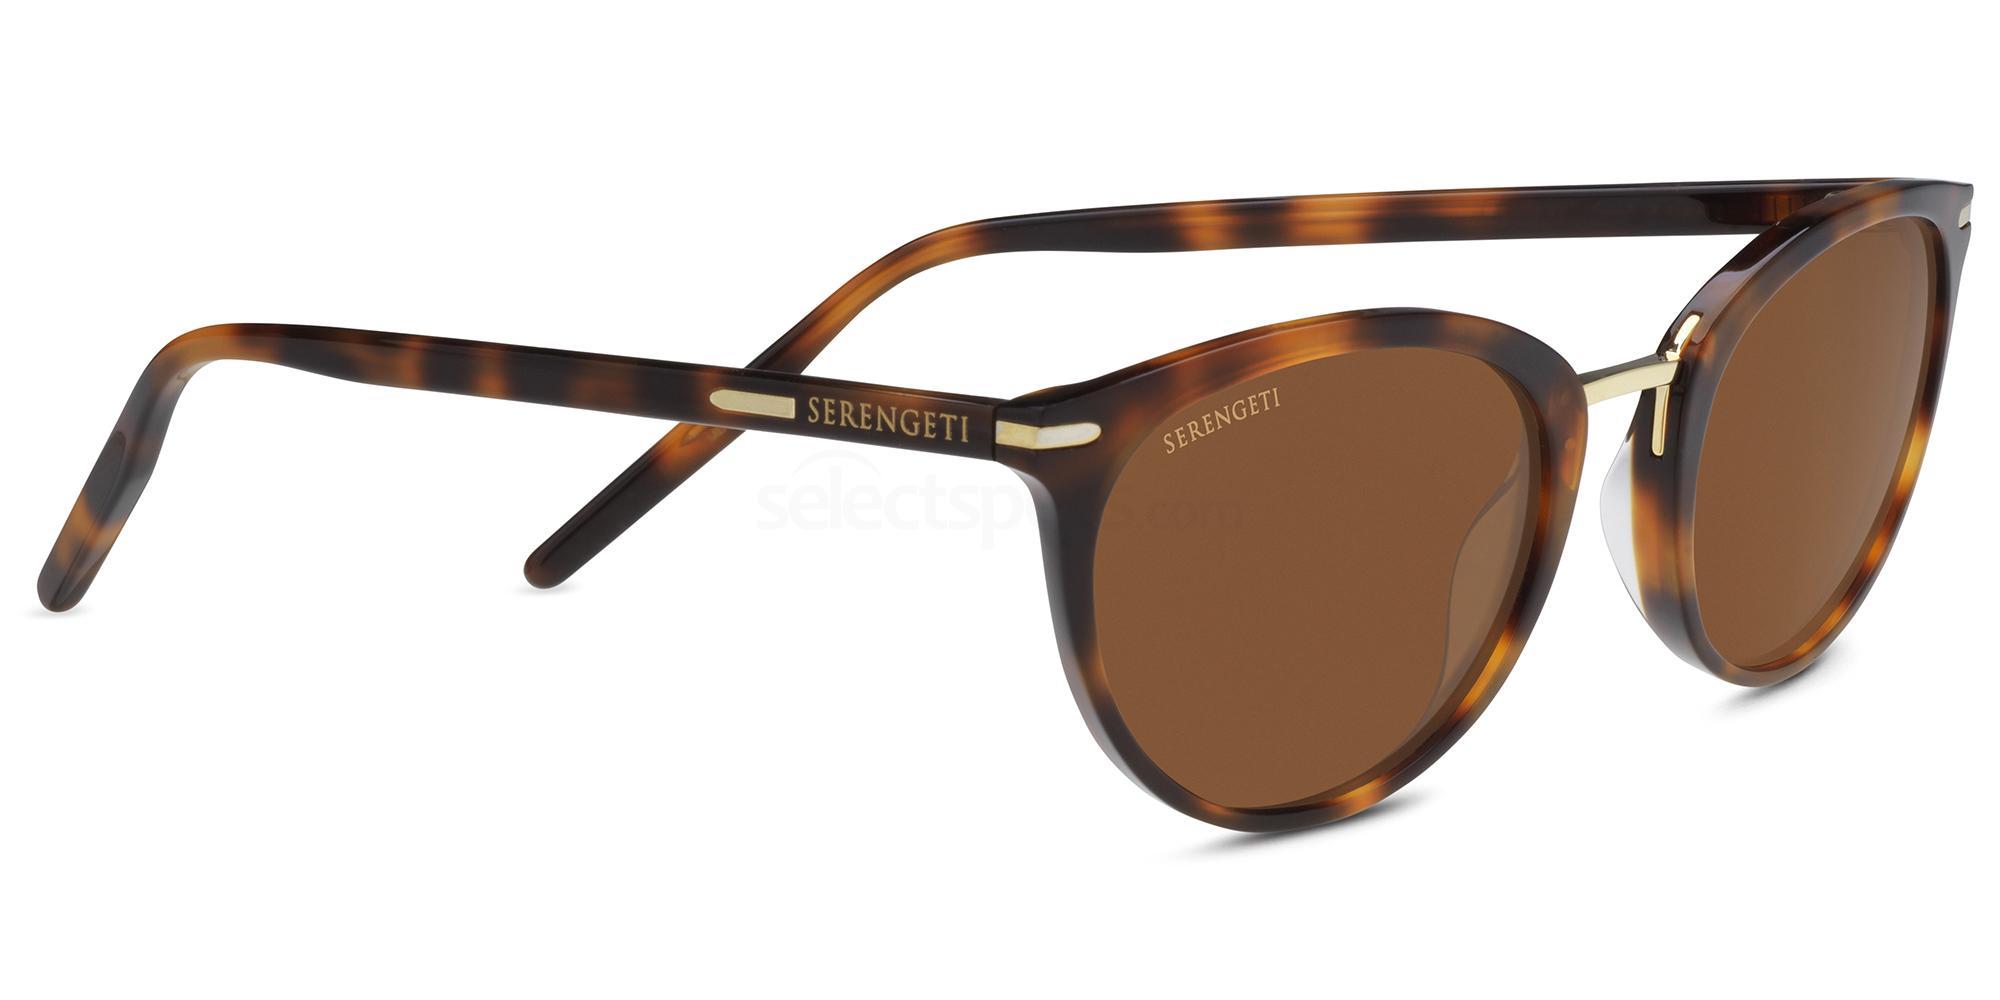 8844 ELYNA Sunglasses, Serengeti